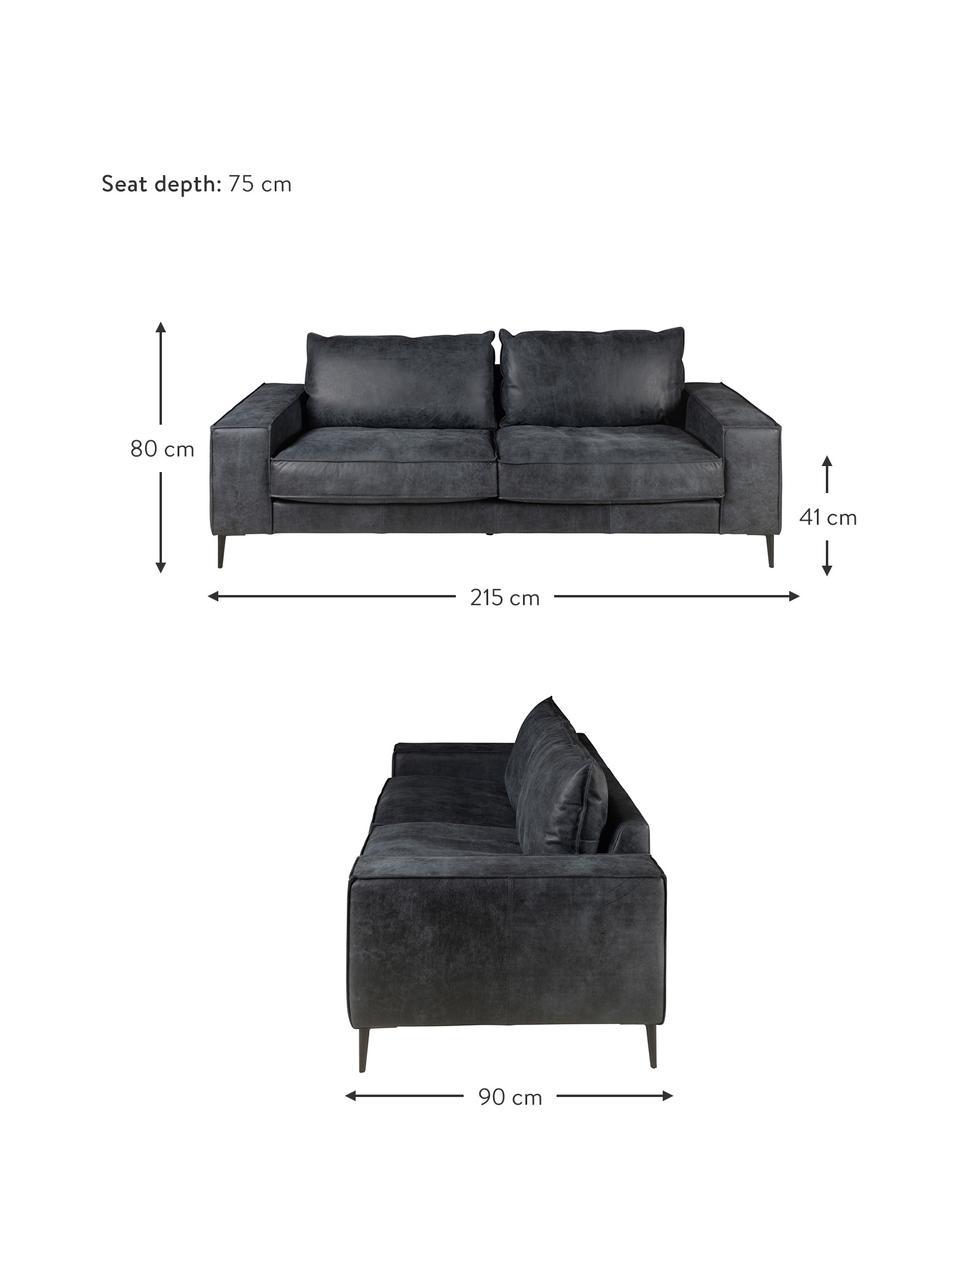 Leder-Sofa Brett (3-Sitzer) in Schwarz-Grau im Industrial Design, Bezug: Rindsleder, glatt, Gestell: Aluminium, lackiert, Leder Schwarz-Grau, B 215 x T 90 cm